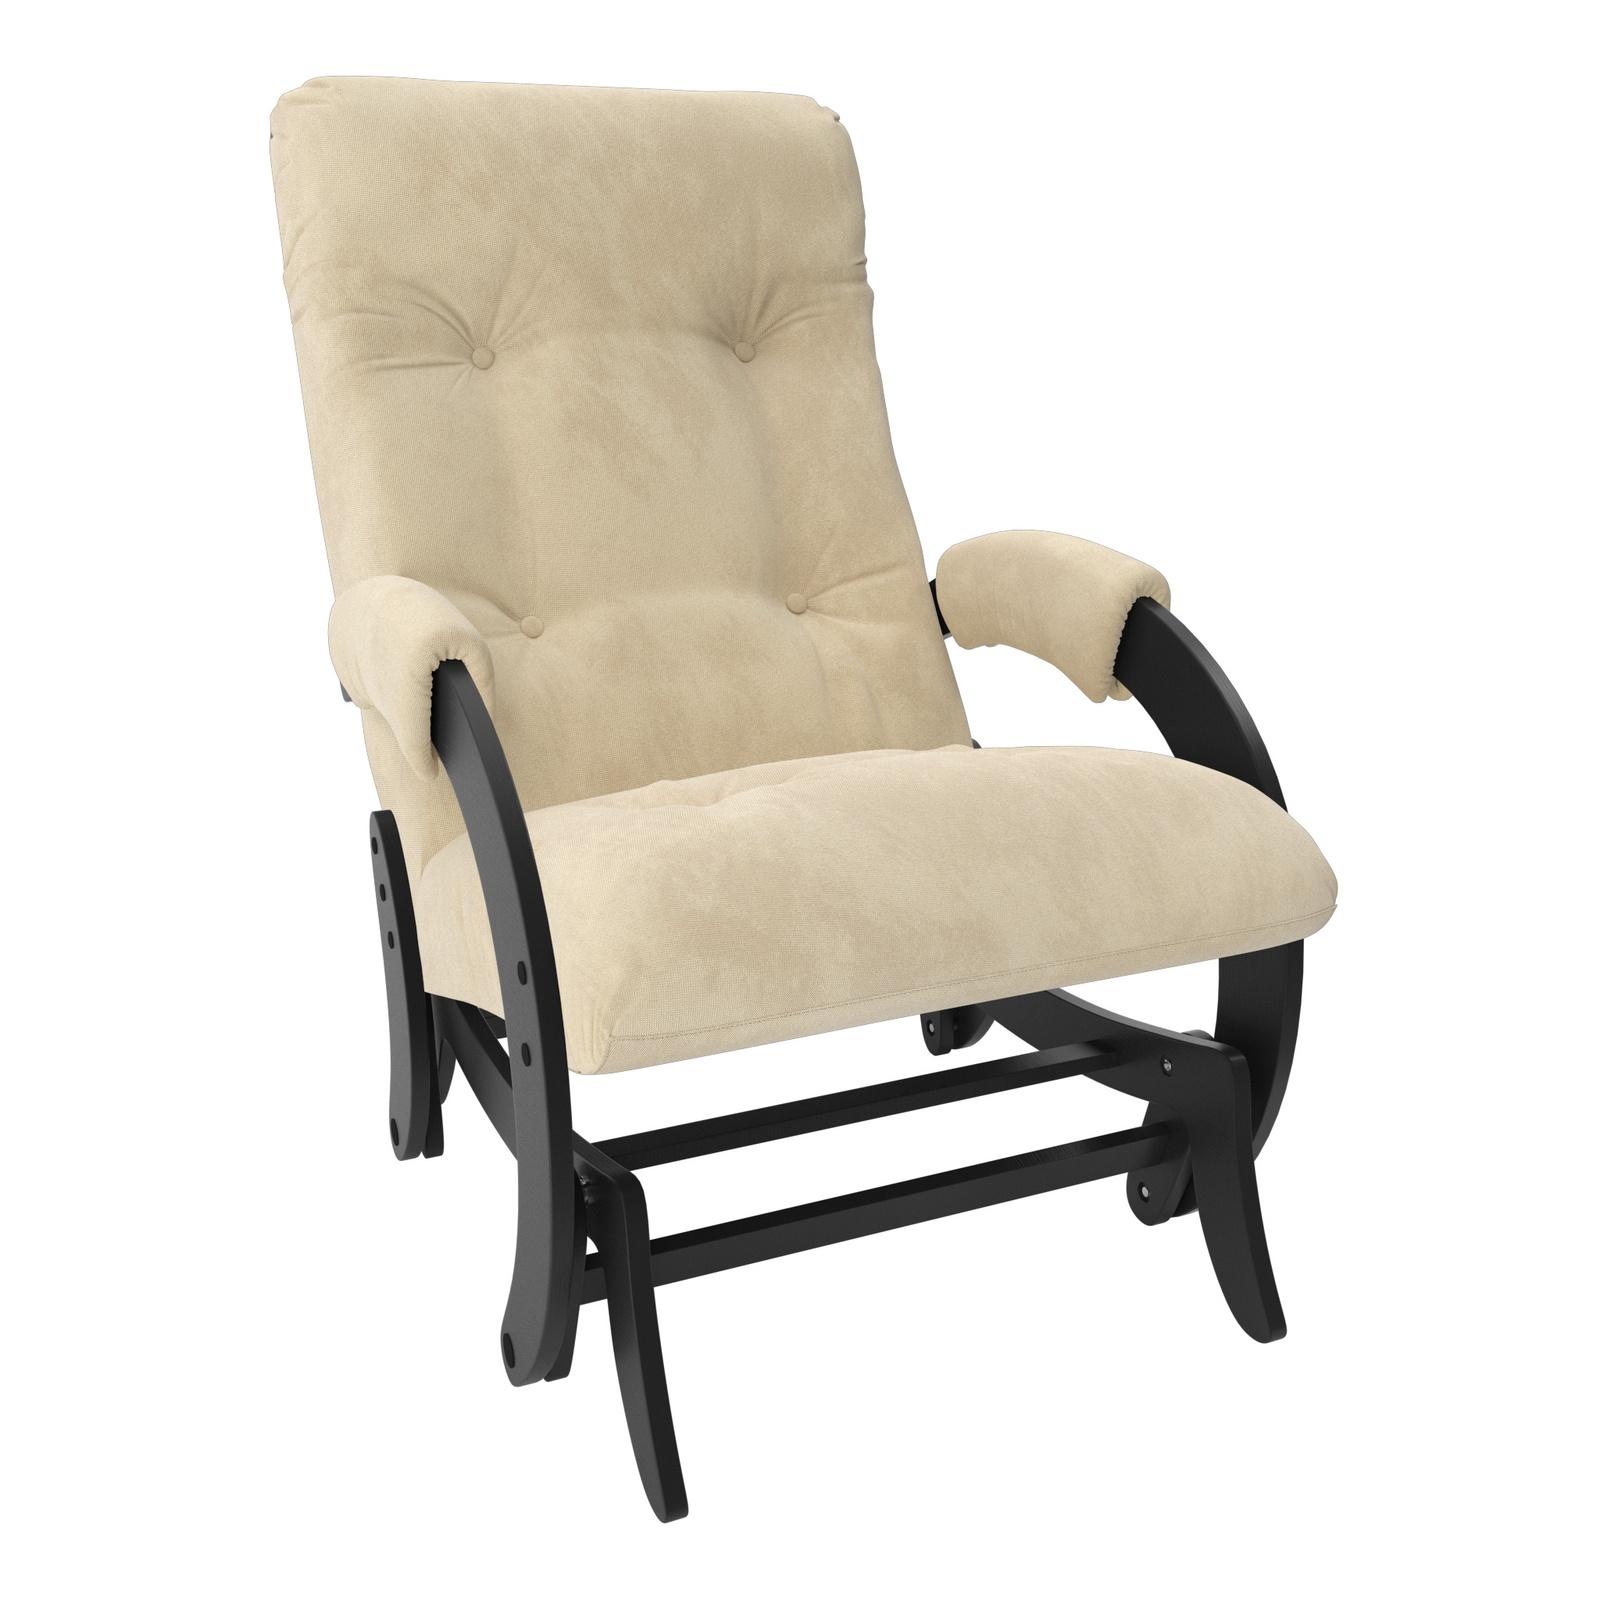 Кресло-качалка Комфорт model-68, бежевый